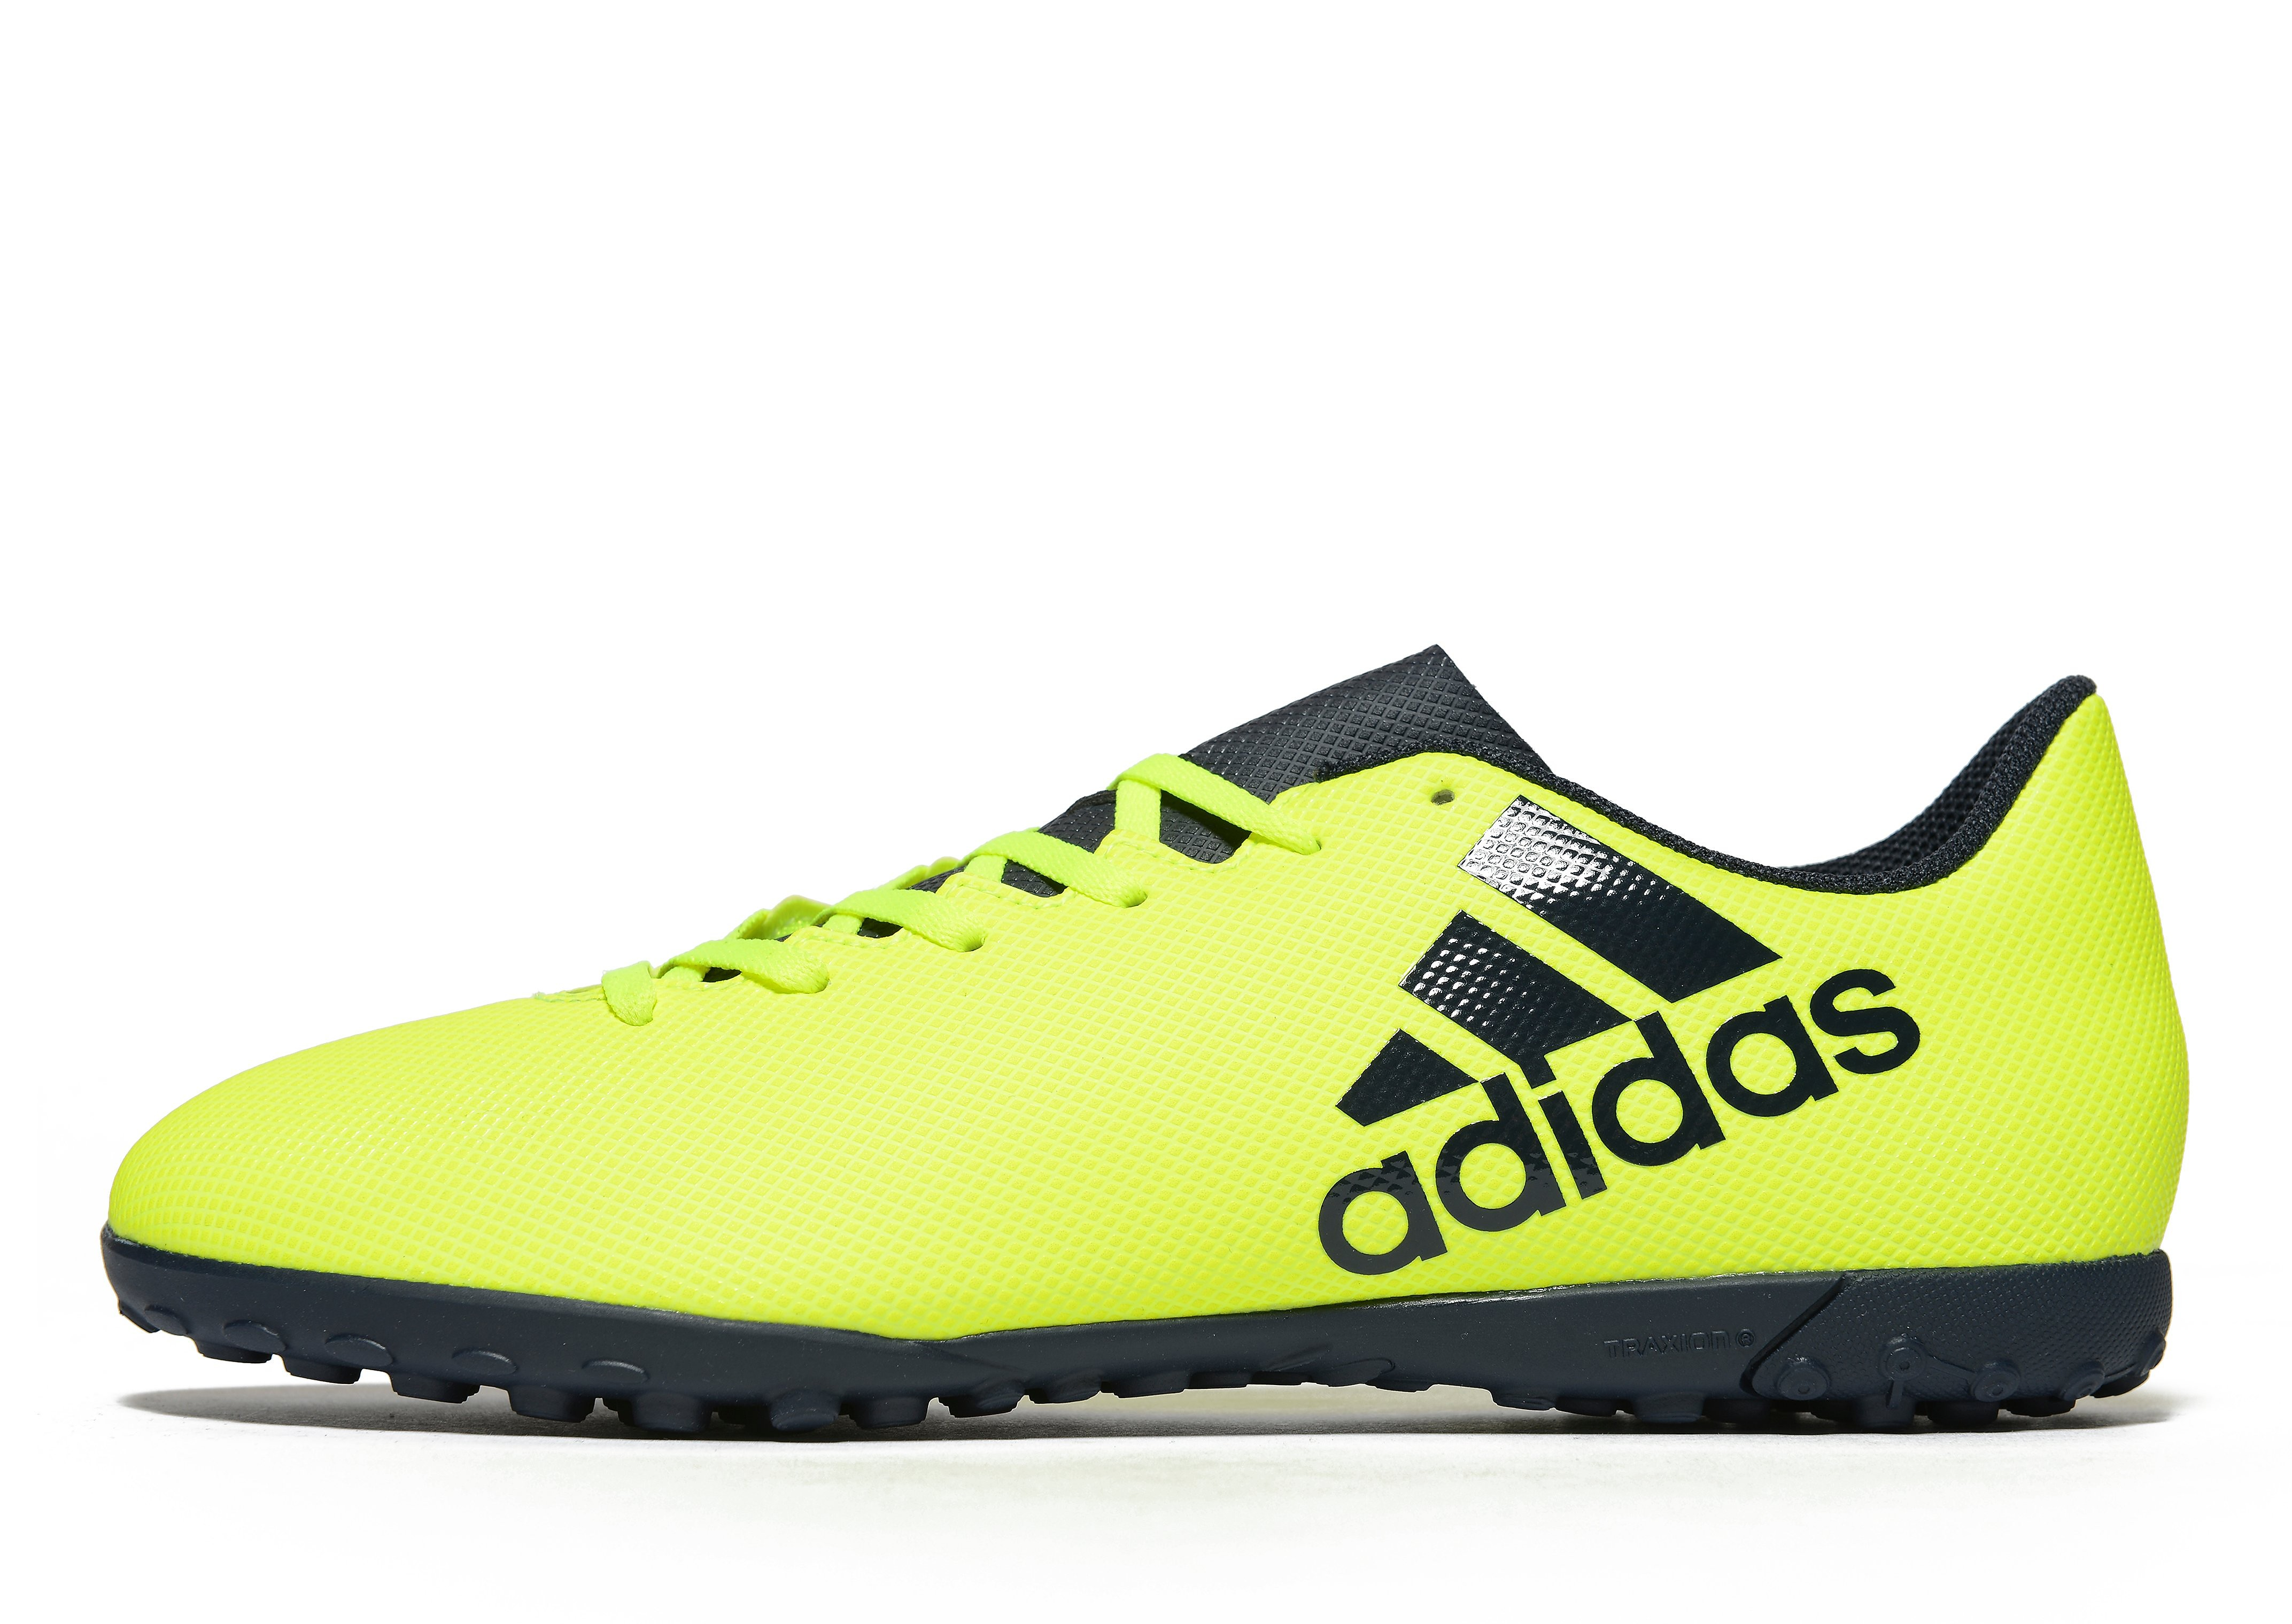 adidas Ocean Storm X 17.4 TF